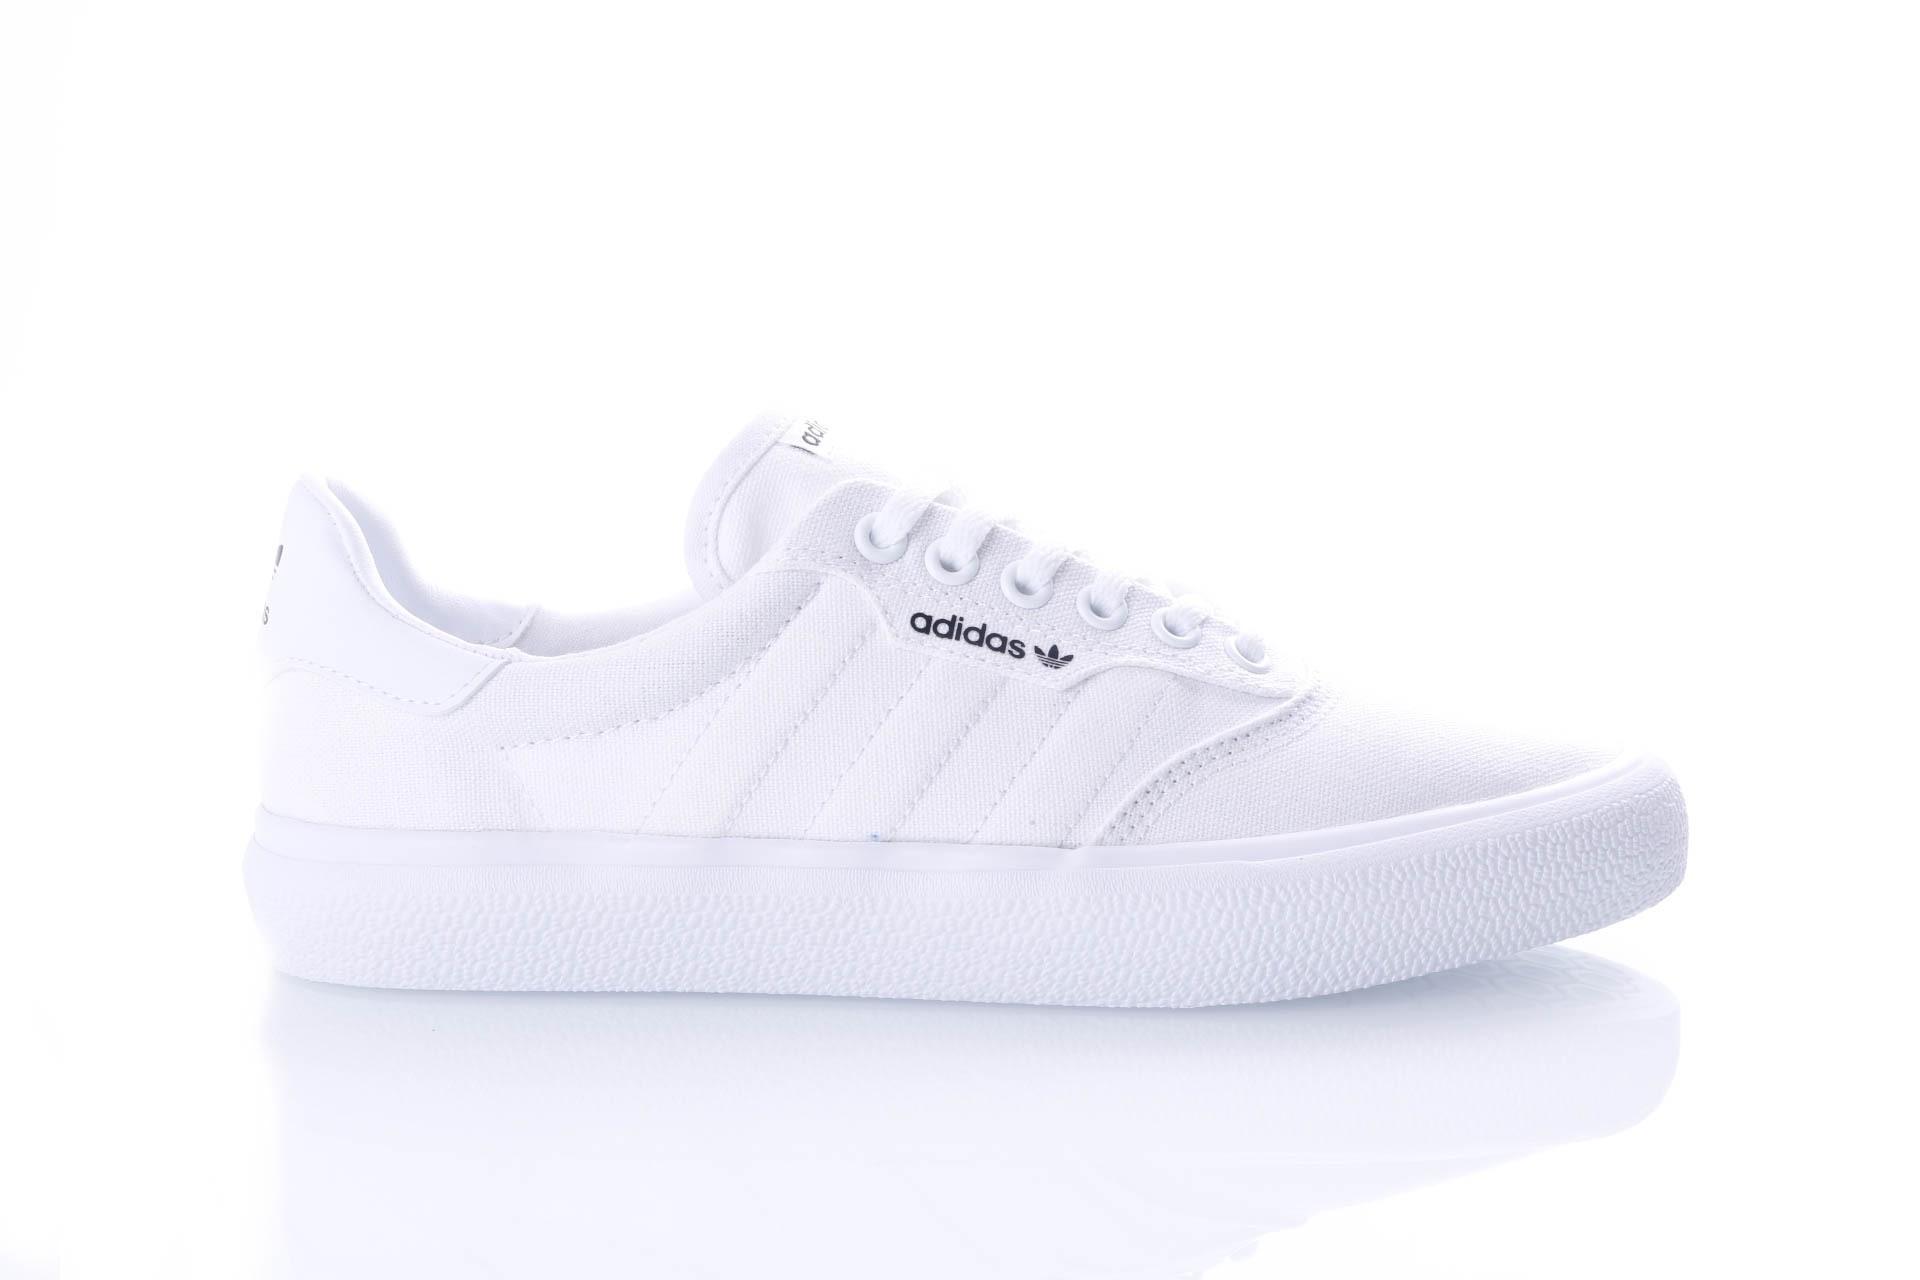 Afbeelding van Adidas B22705 3Mc Ftwrwhite/Ftwrwhite/Goldmet